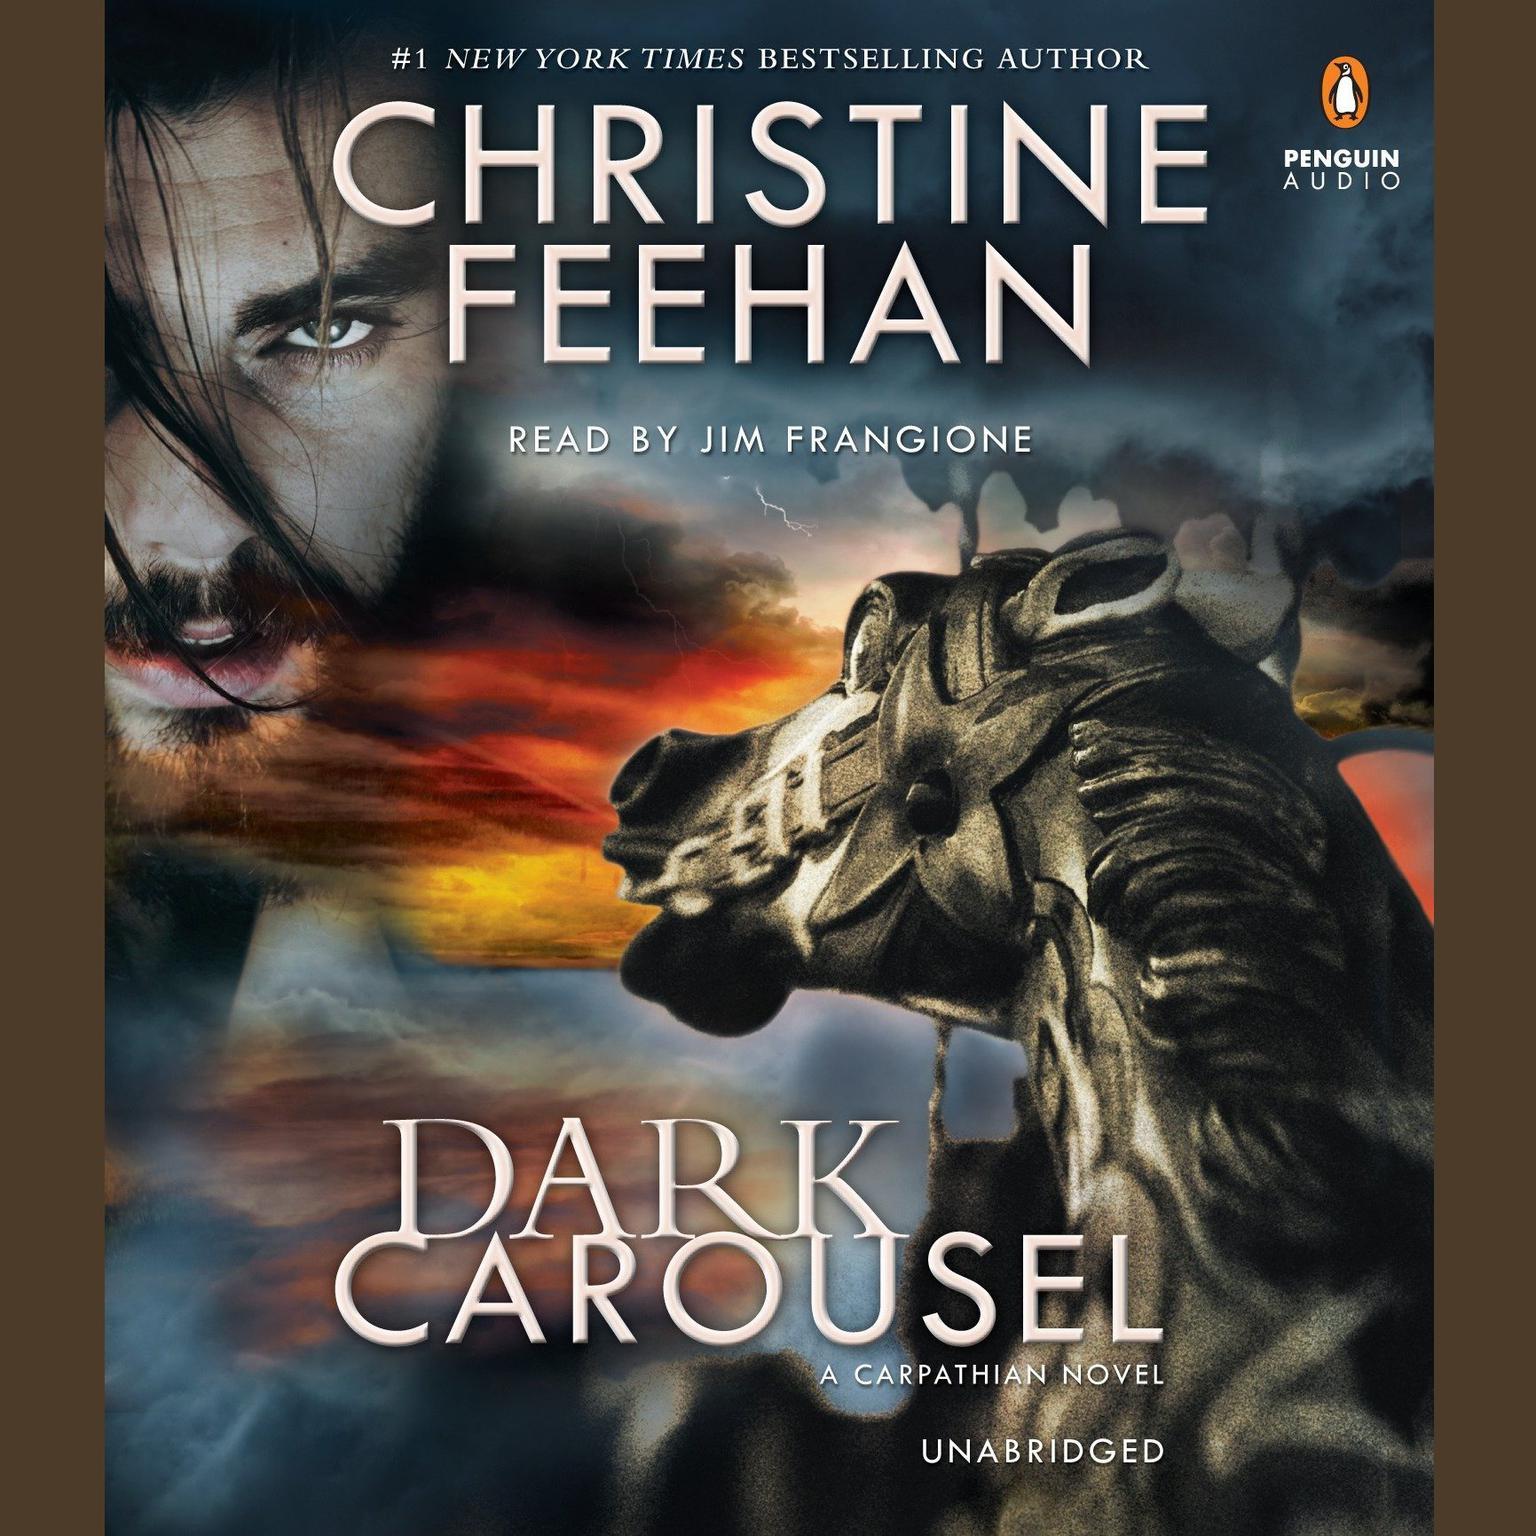 Printable Dark Carousel: A Carpathian Novel Audiobook Cover Art